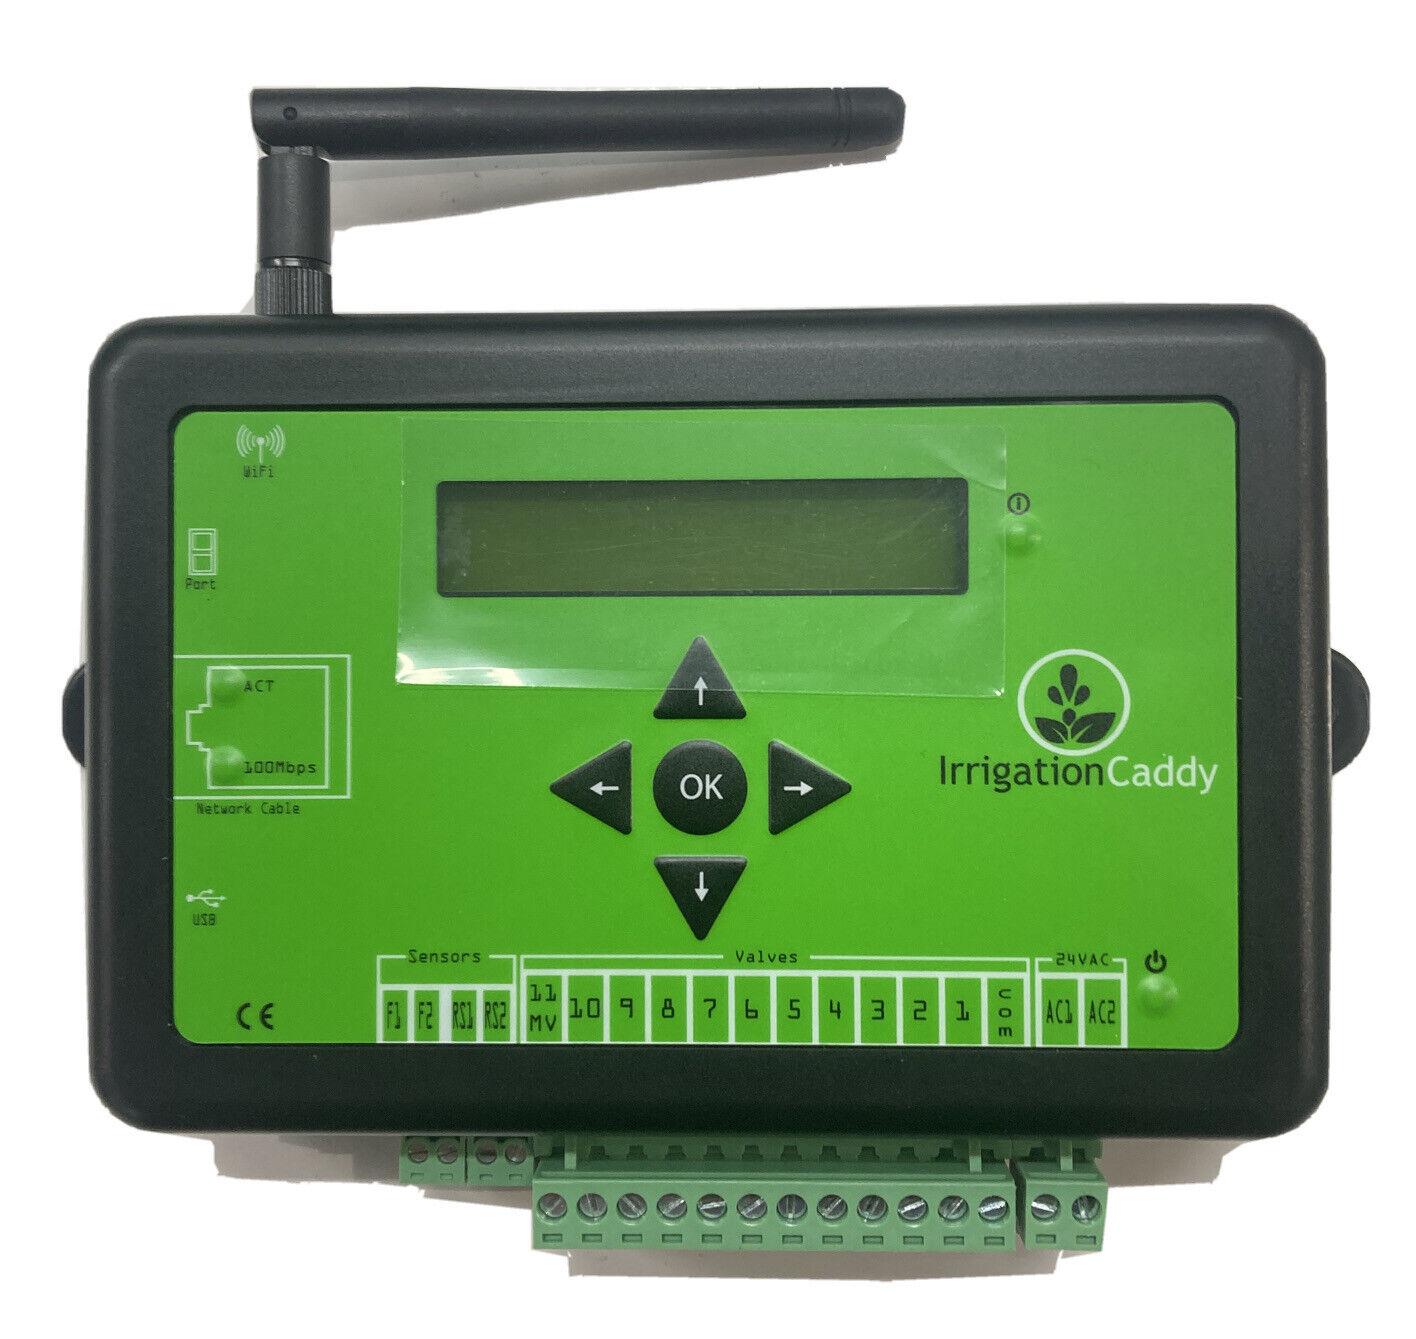 IrrigationCaddy 11-Zone Wireless Web Based Irrigation Control System IC-W1